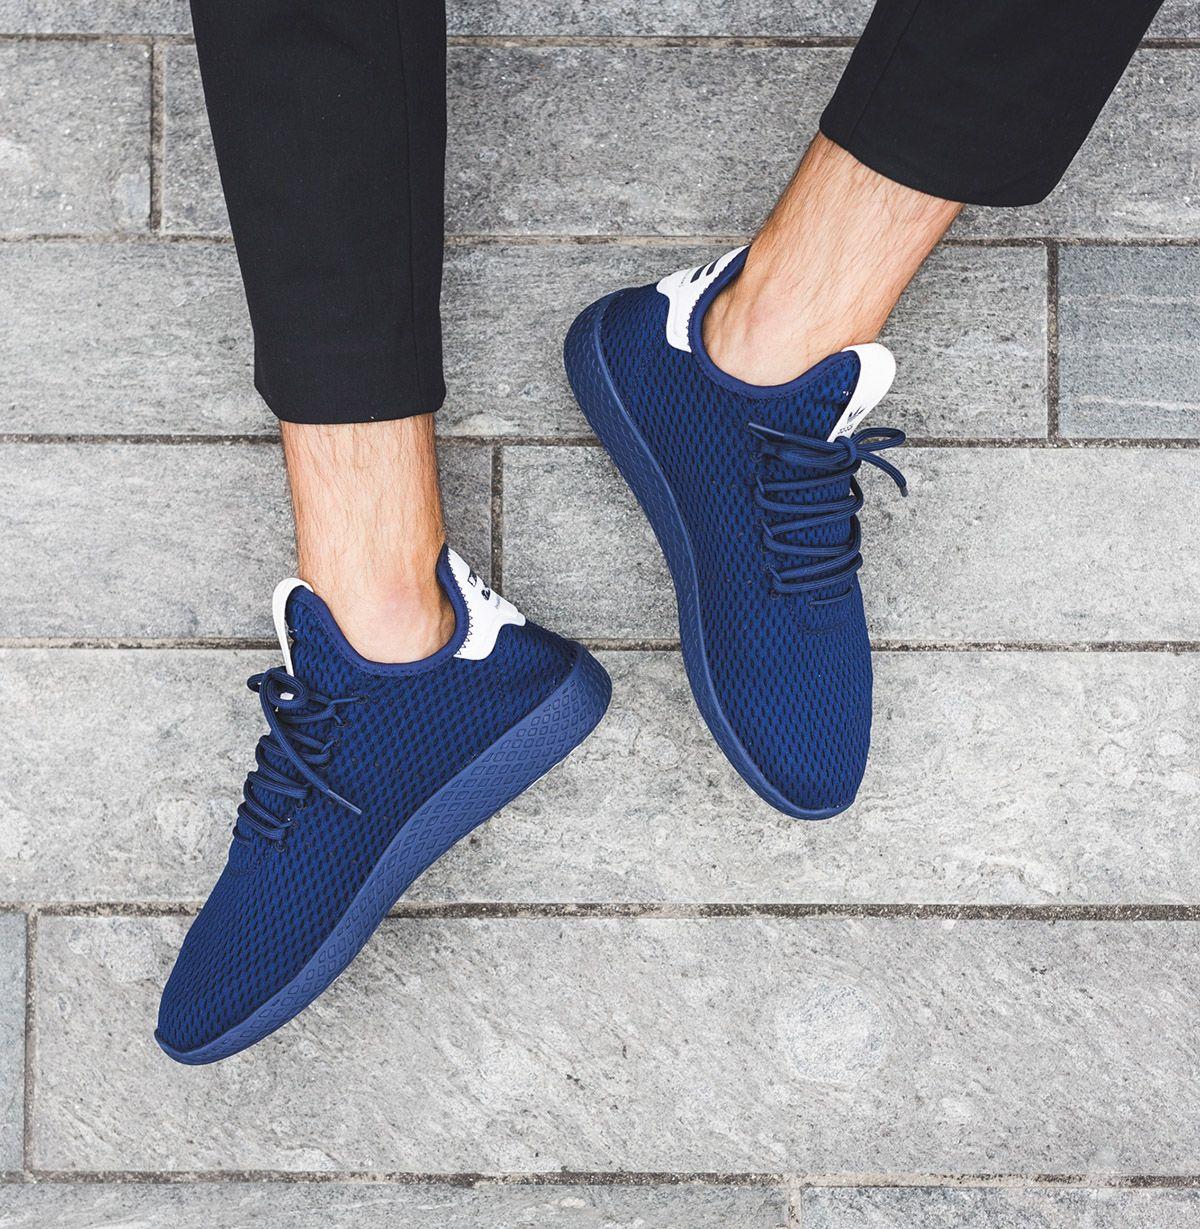 ed97caf74ef5 On-Foot  Pharrell Williams x adidas Tennis Hu  New York  Pack - EU Kicks   Sneaker Magazine